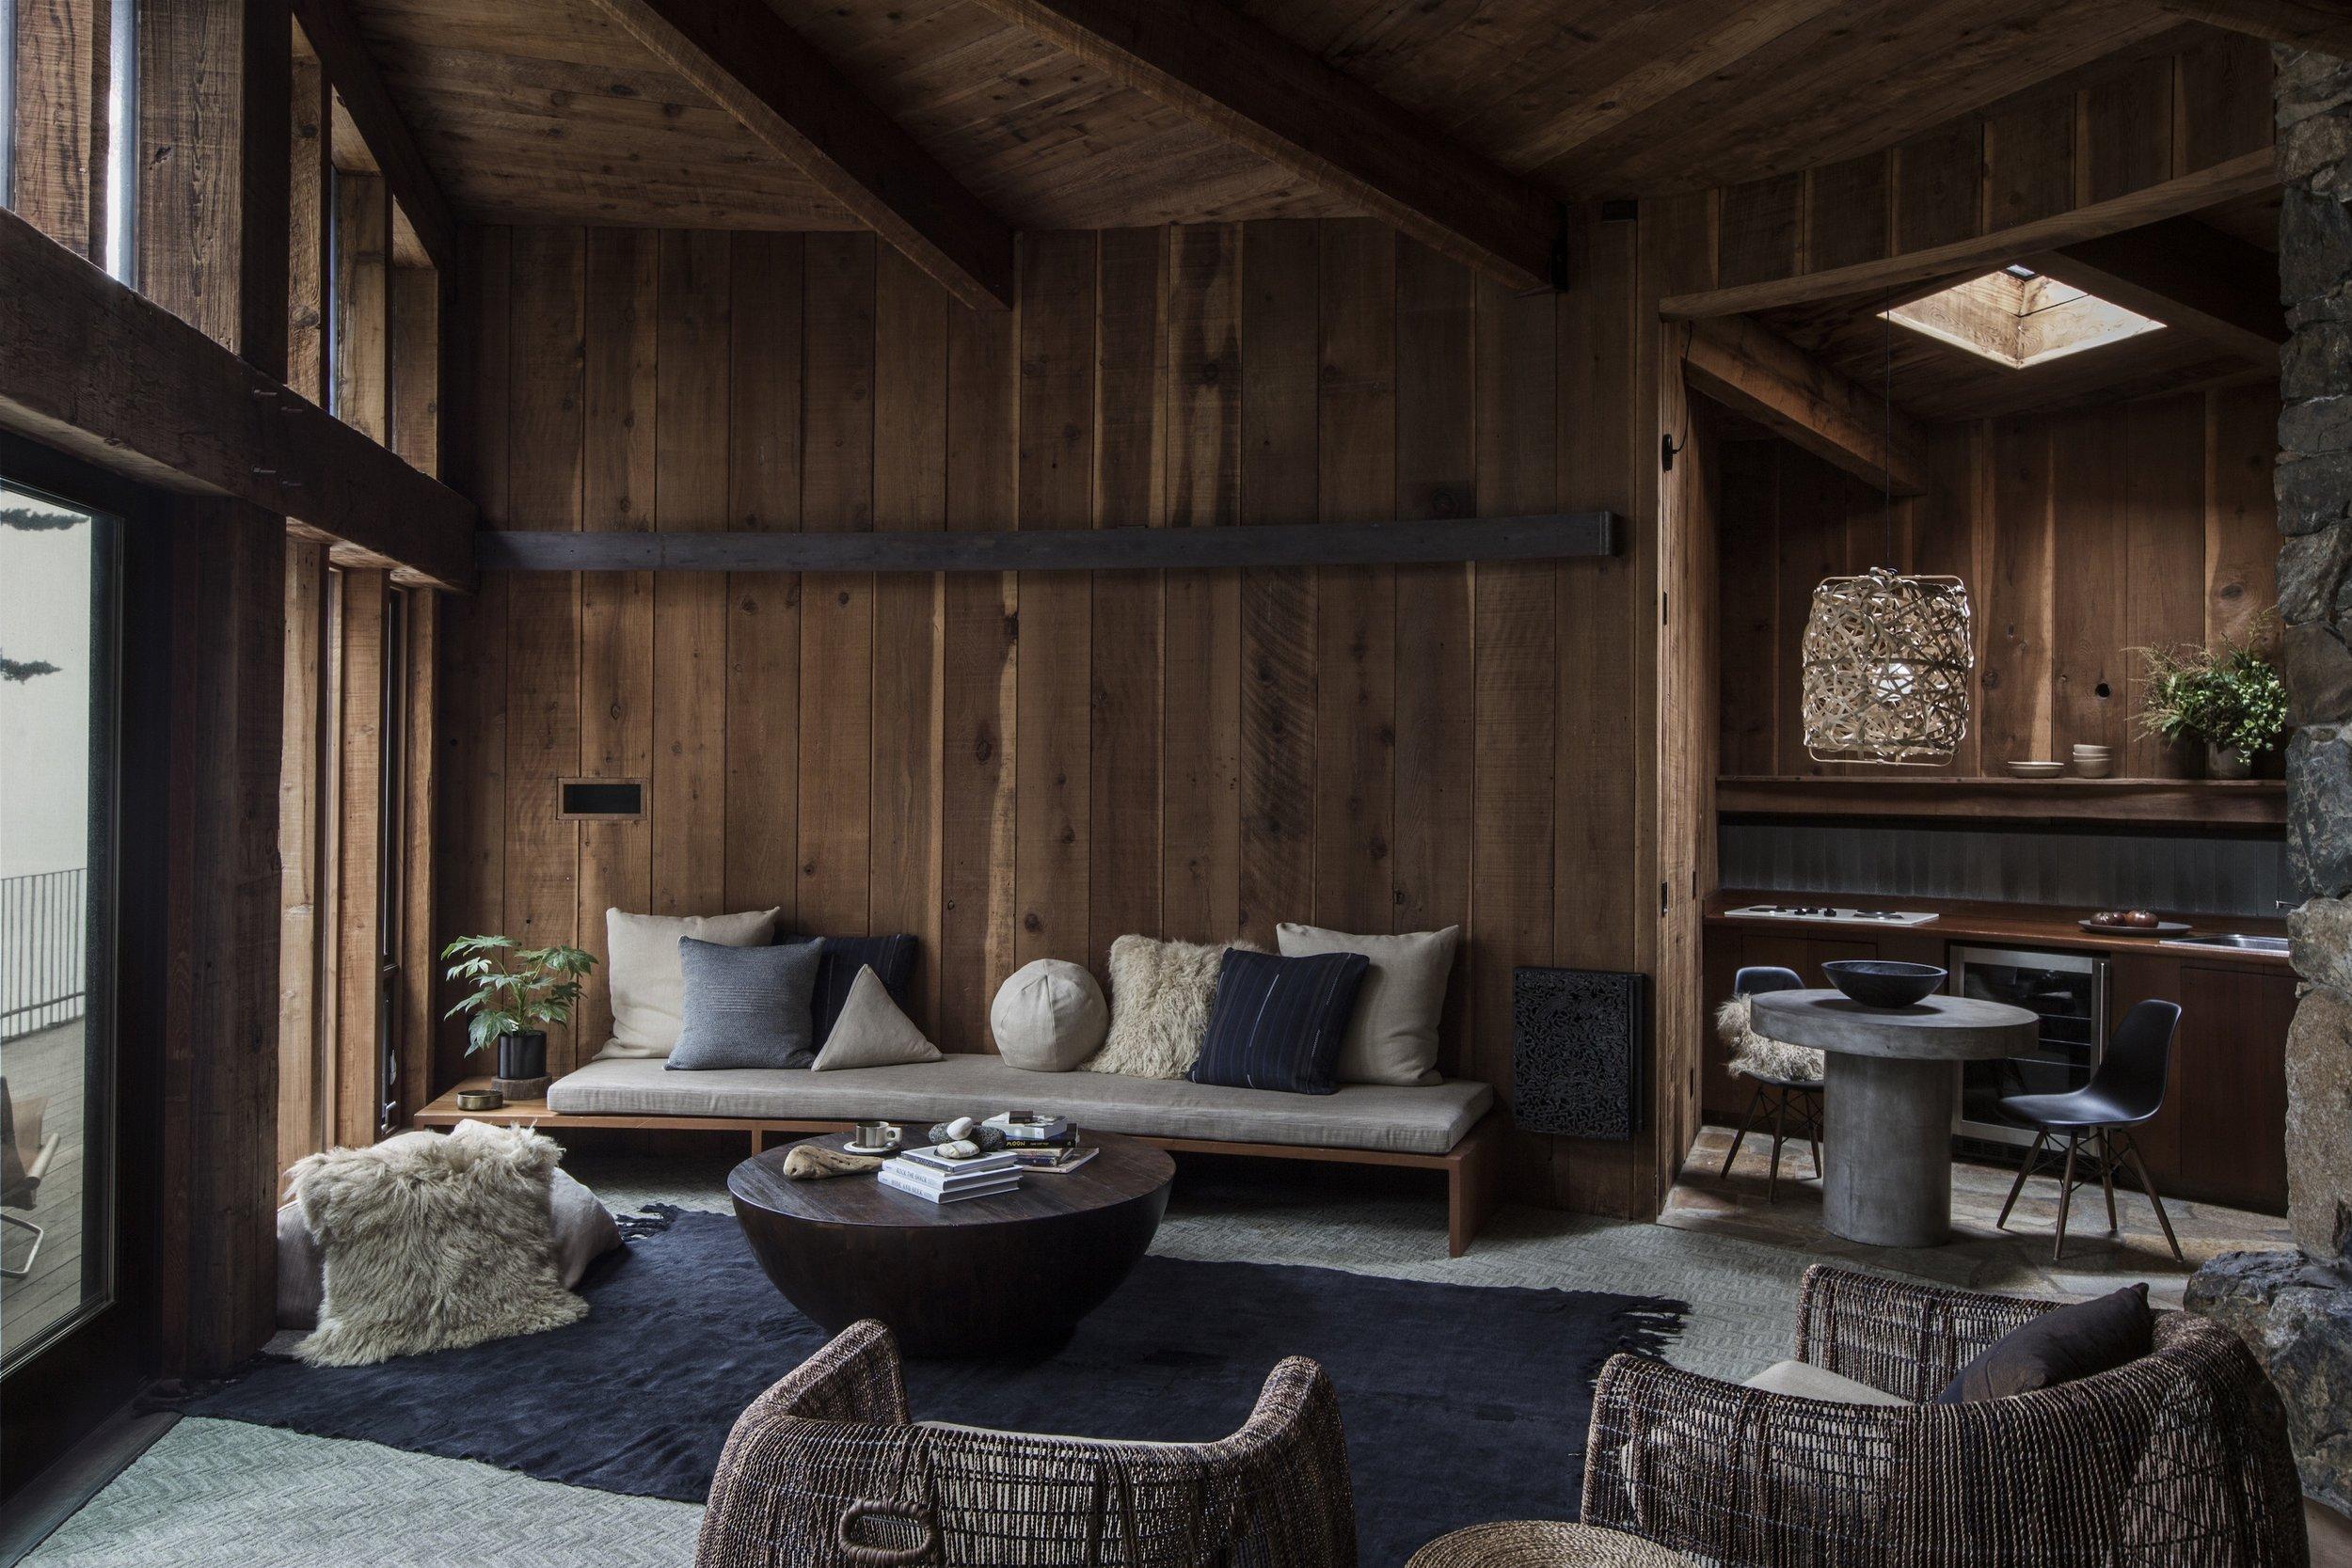 esalen-institute-living-room-big-sur-wood-paneling-1.jpg